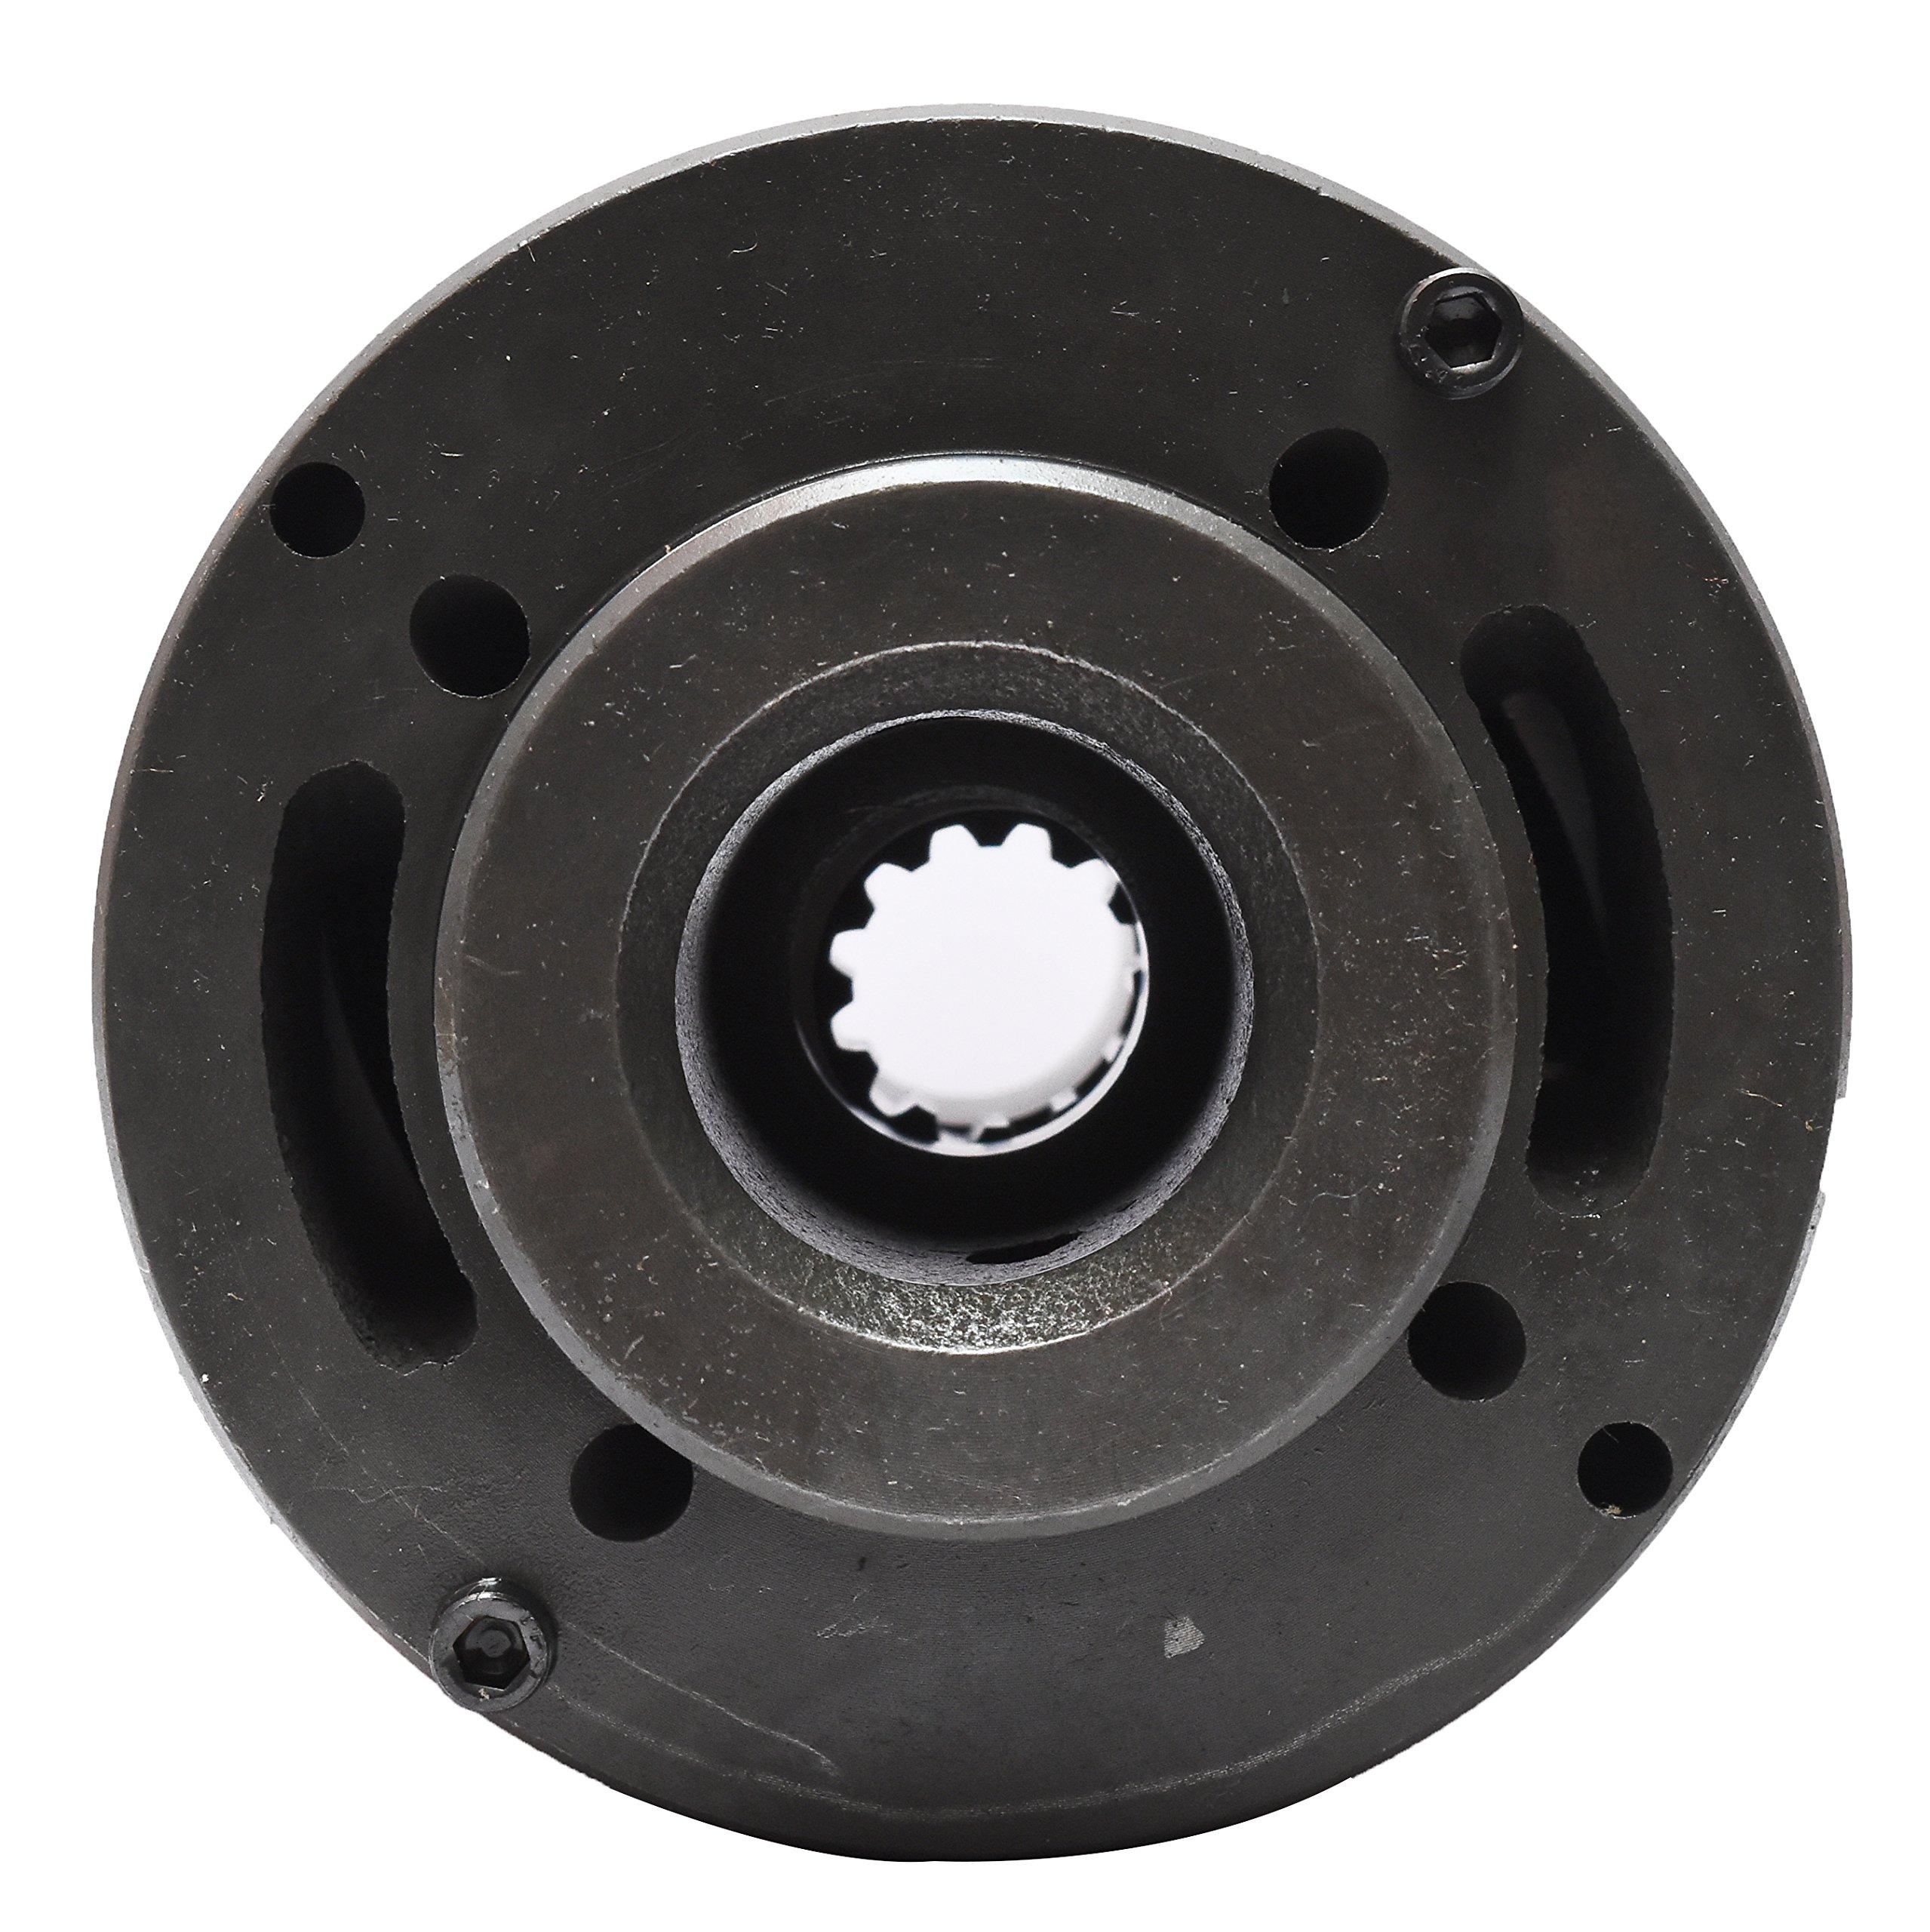 Yuken Hydraulic Vane Pump Spares Catridige Kit CPVR50150-13-R-31